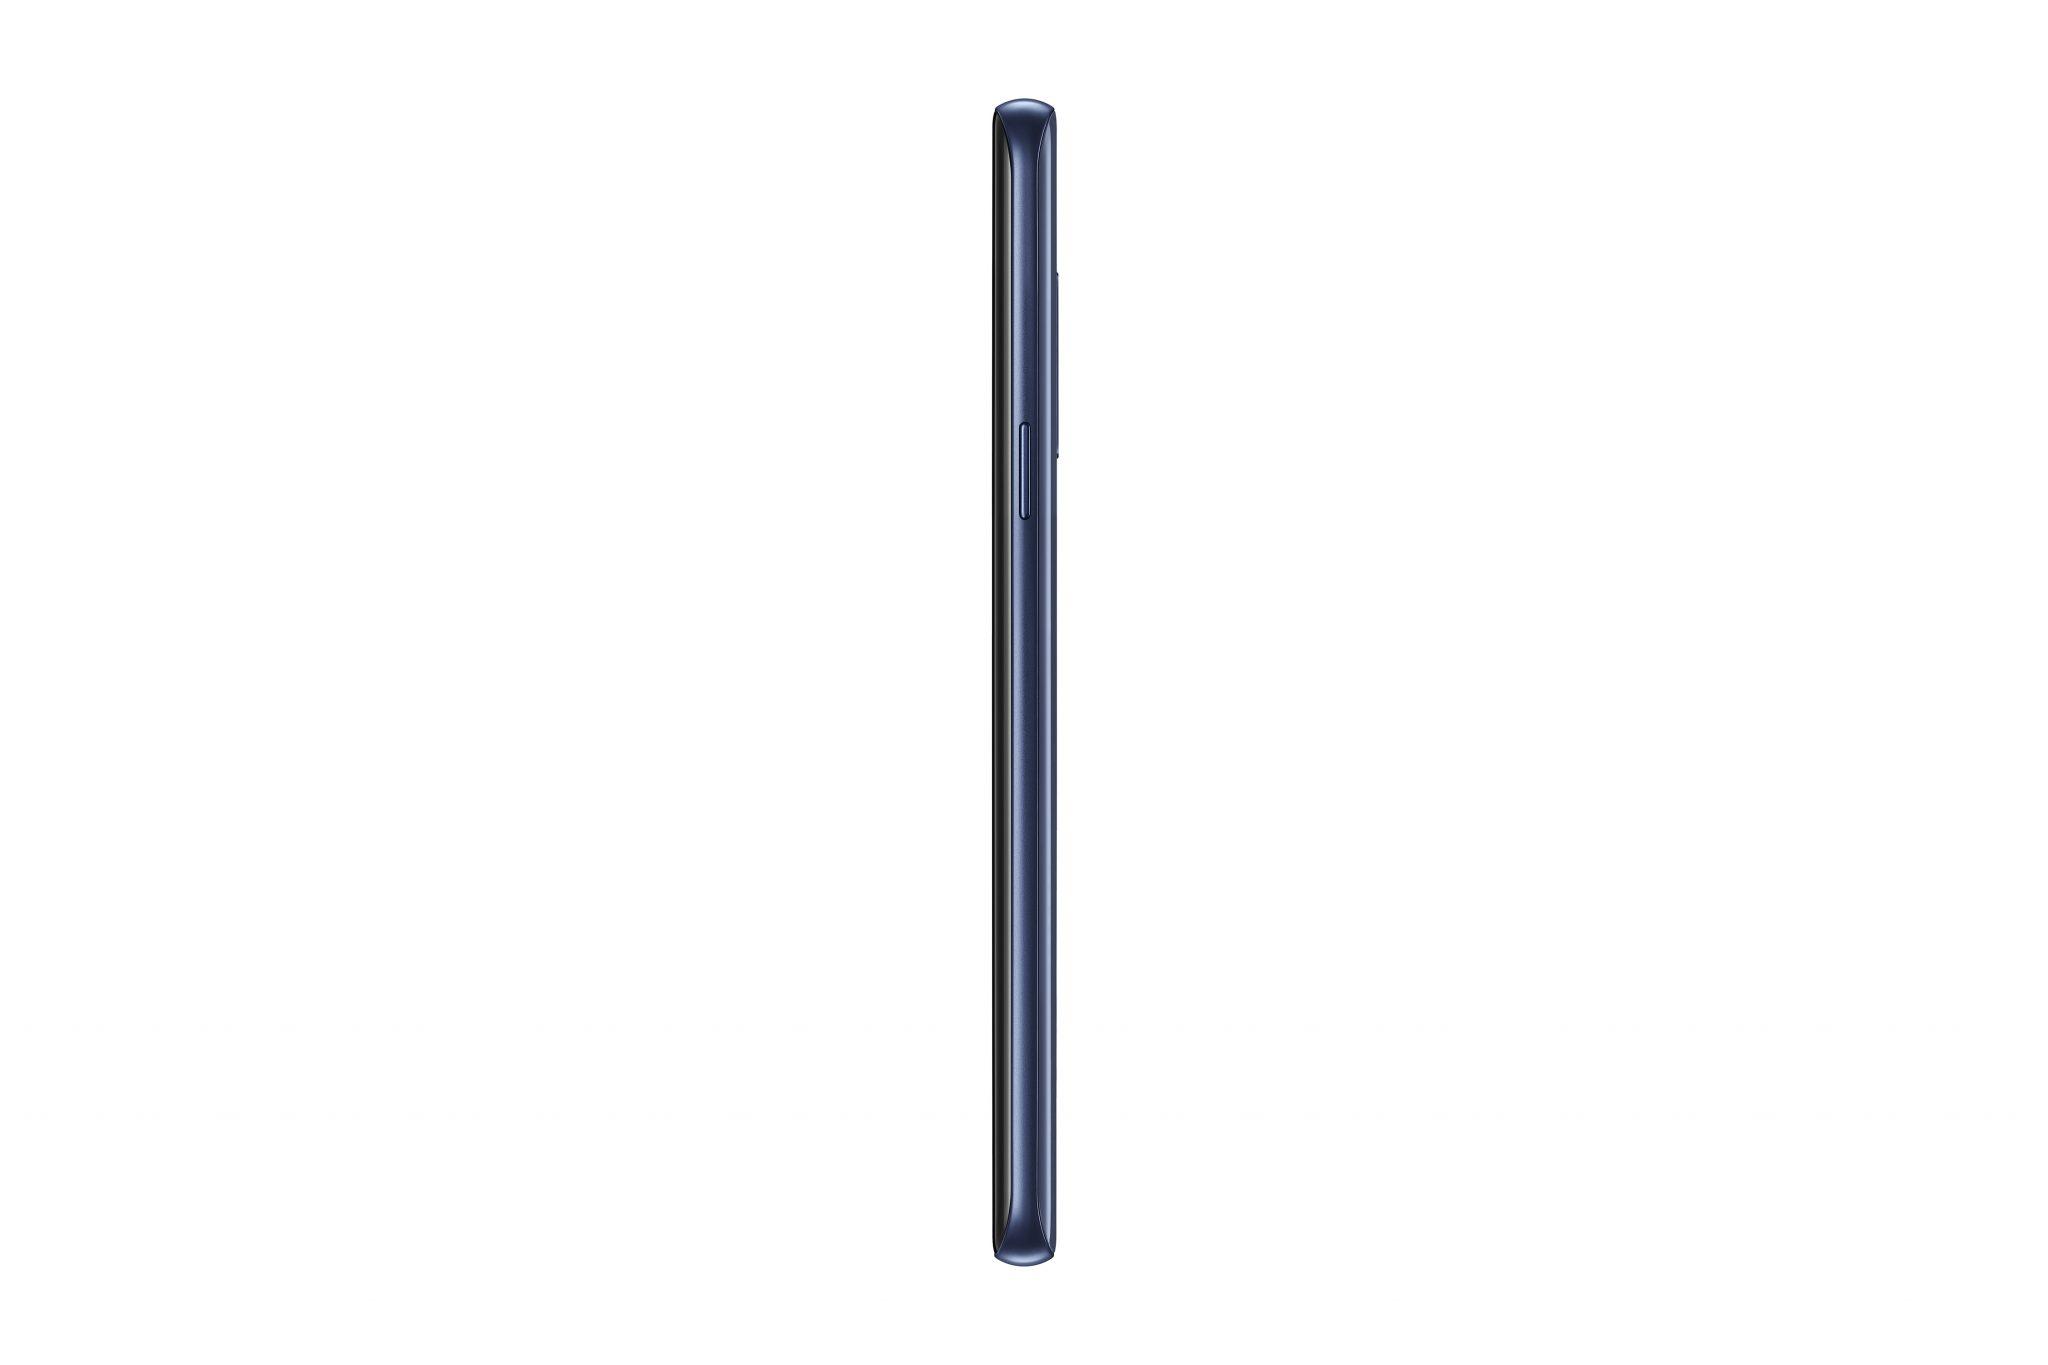 SM G960 GalaxyS9 RSide Blue - SM_G960_GalaxyS9_RSide_Blue